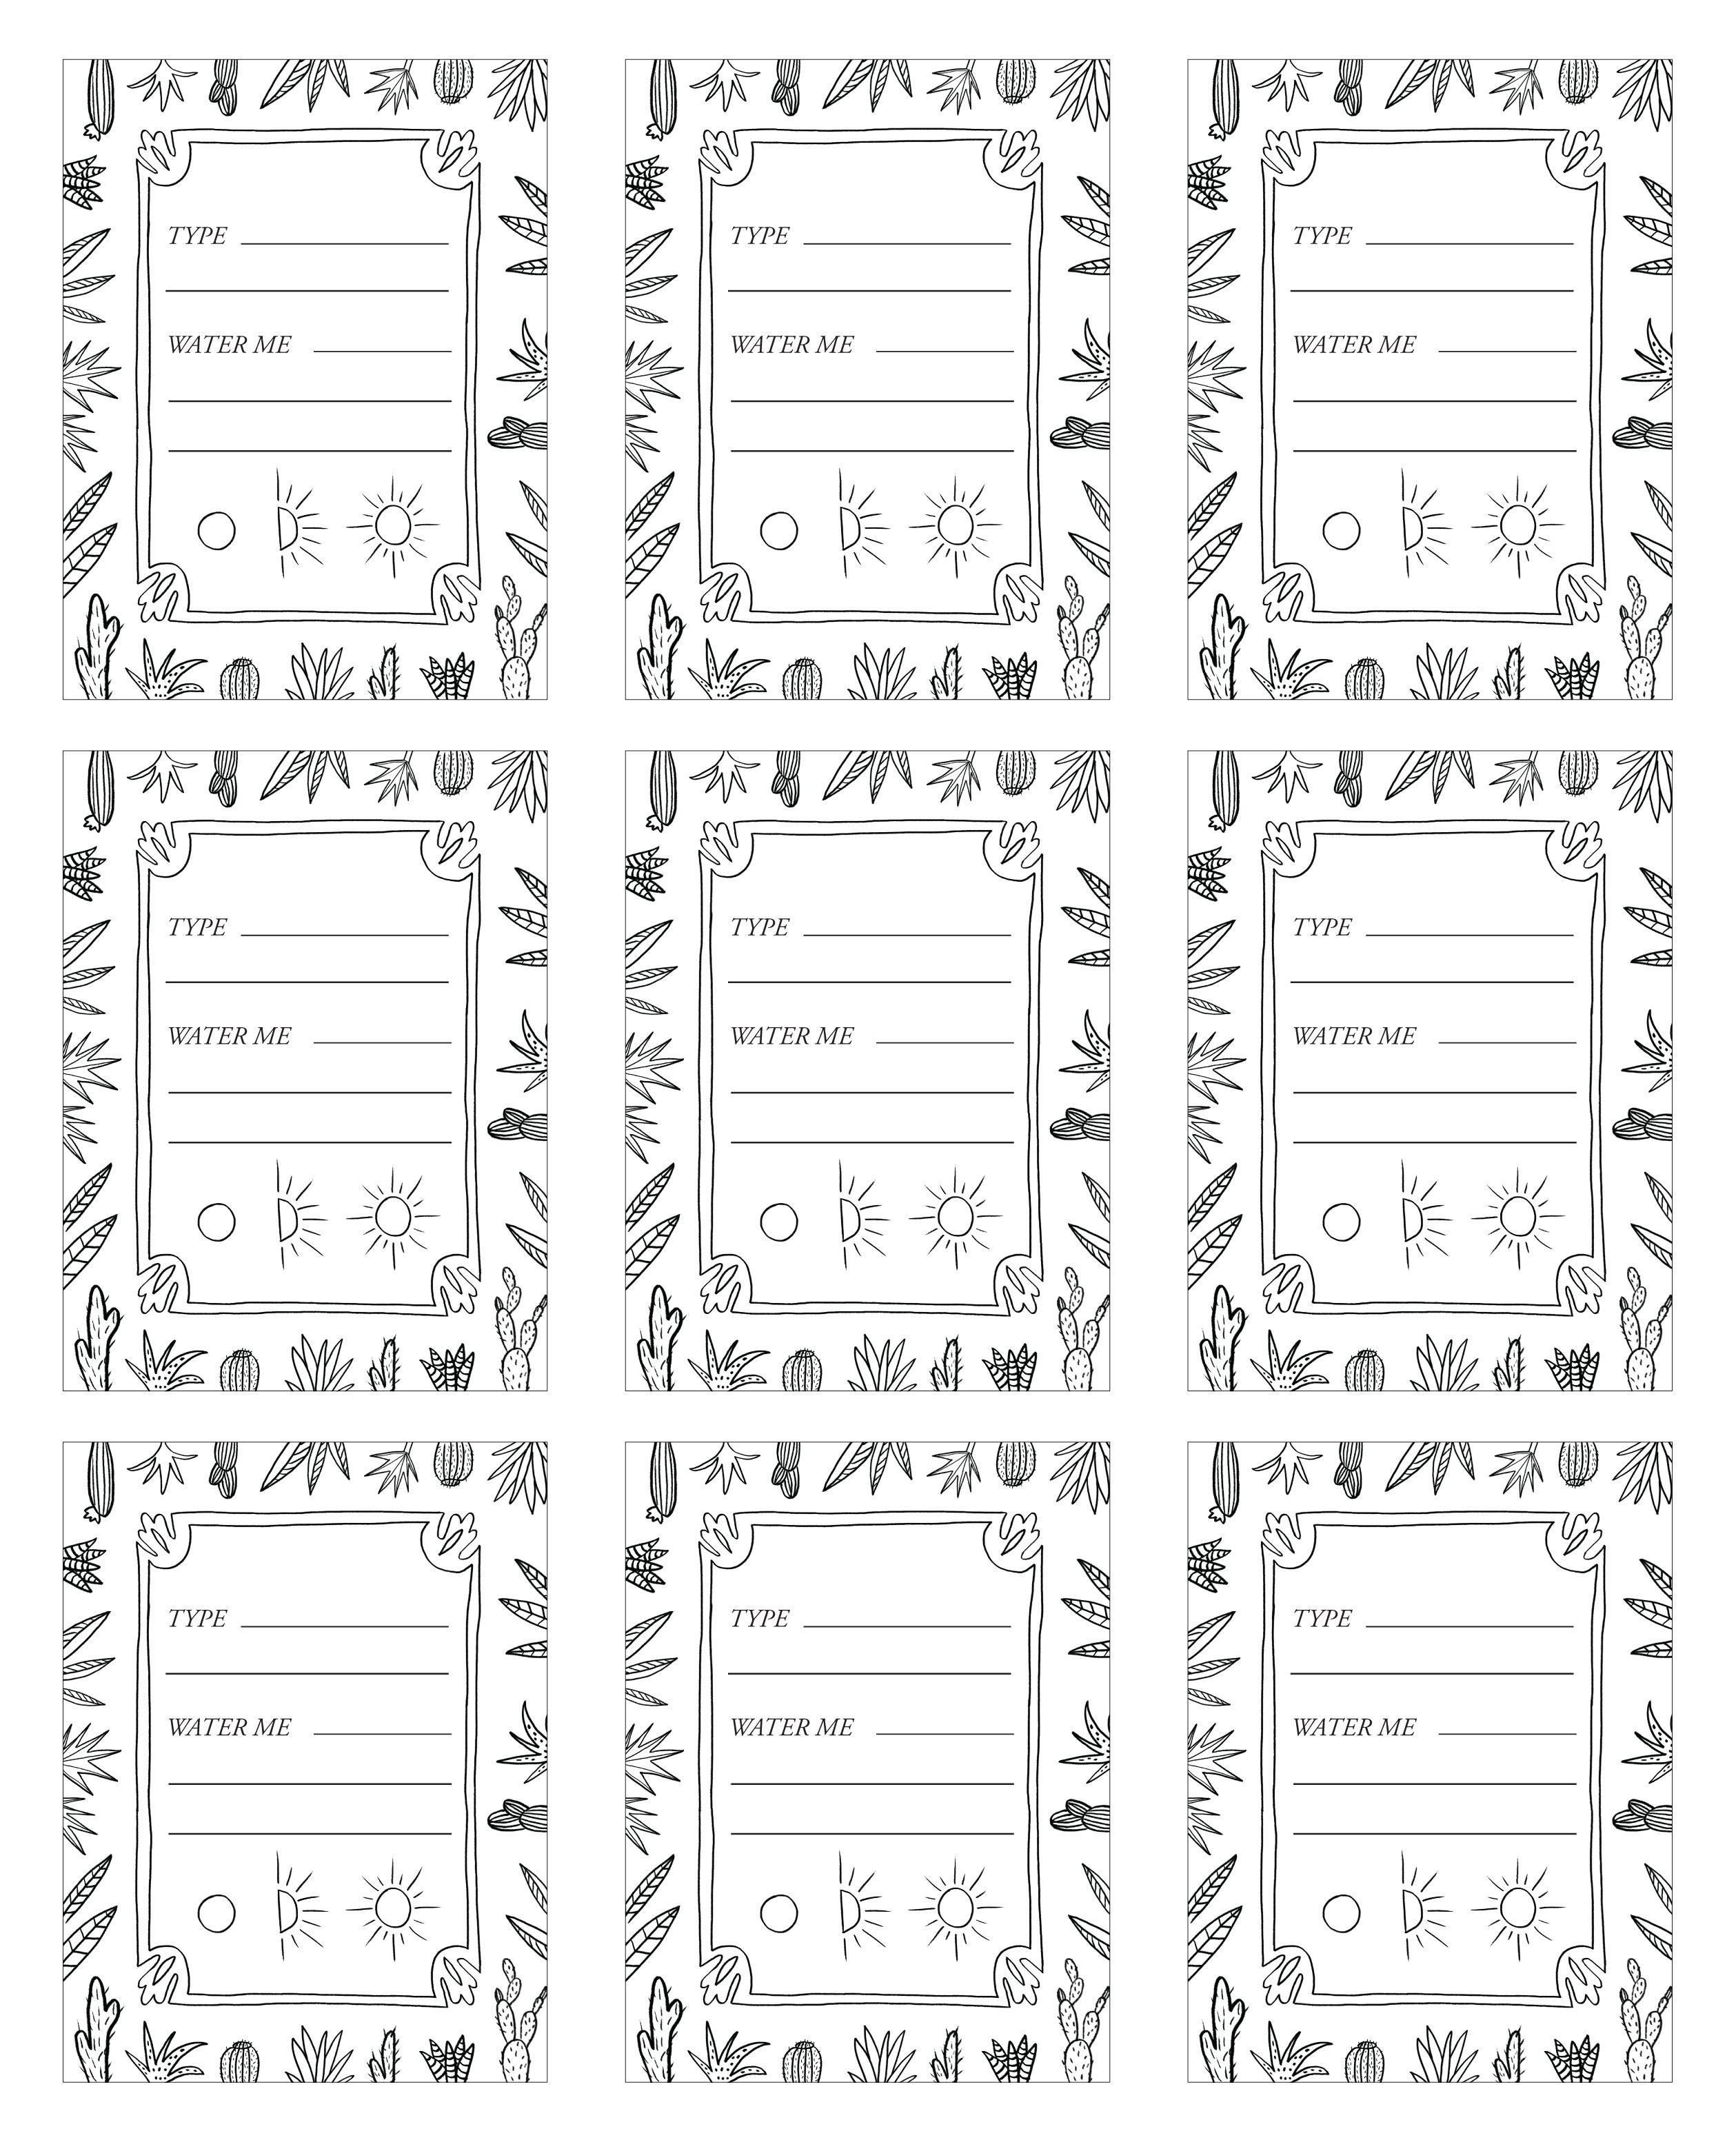 Diy Patternful Planters + Free Printables | Make Me | Plant Labels - Free Printable Plant Labels